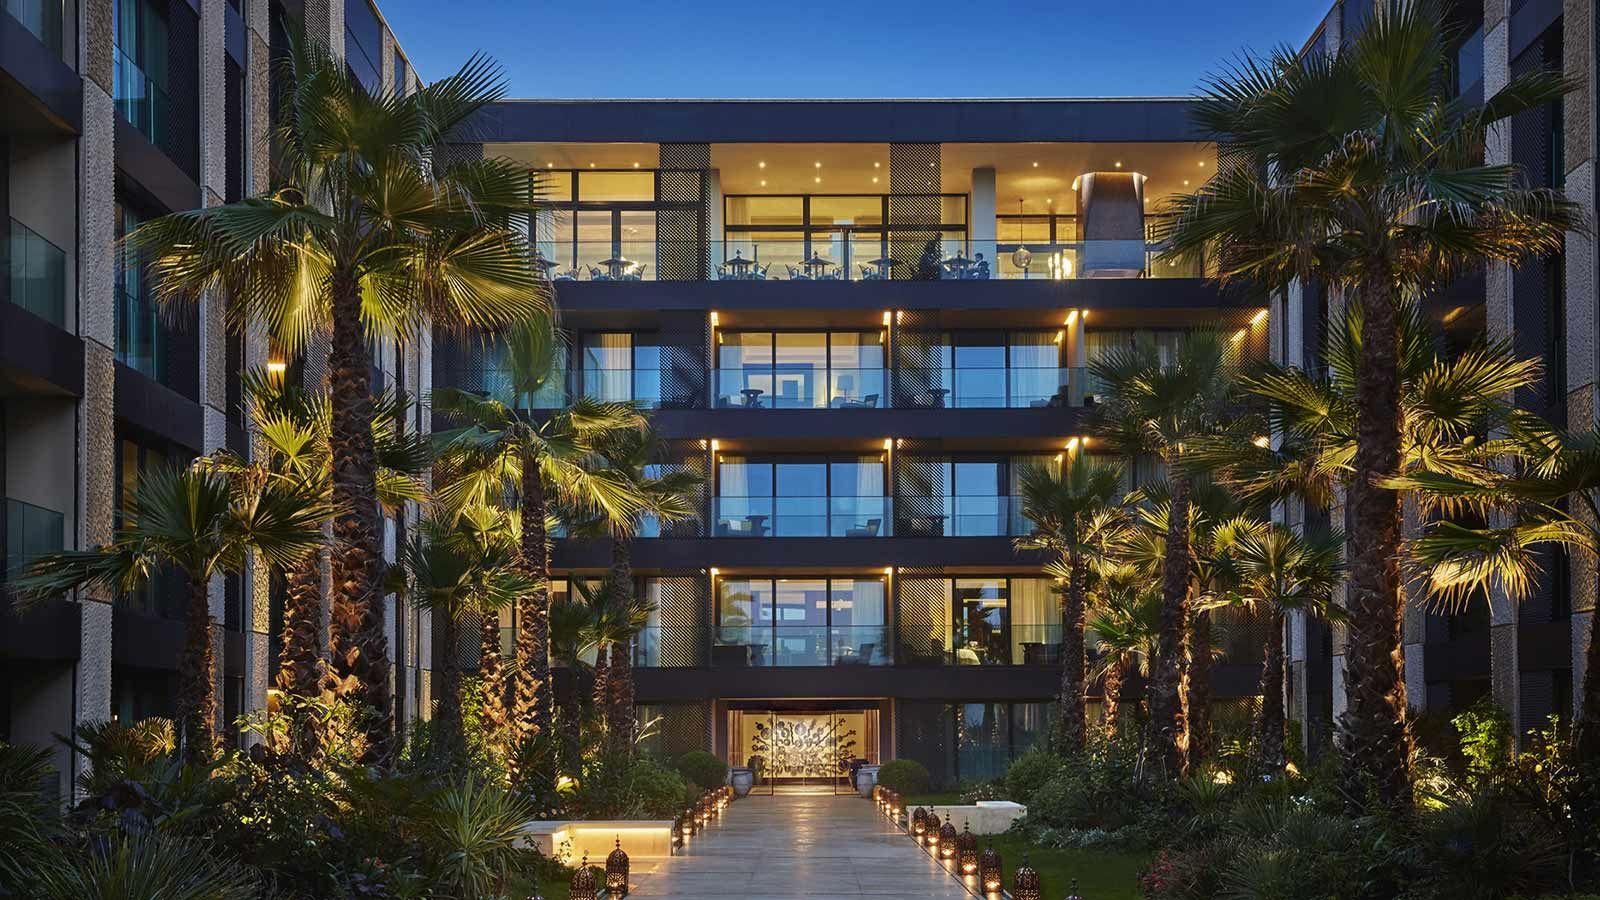 Casablanca Four Seasons Hotel, Building Exterior - Mace Group